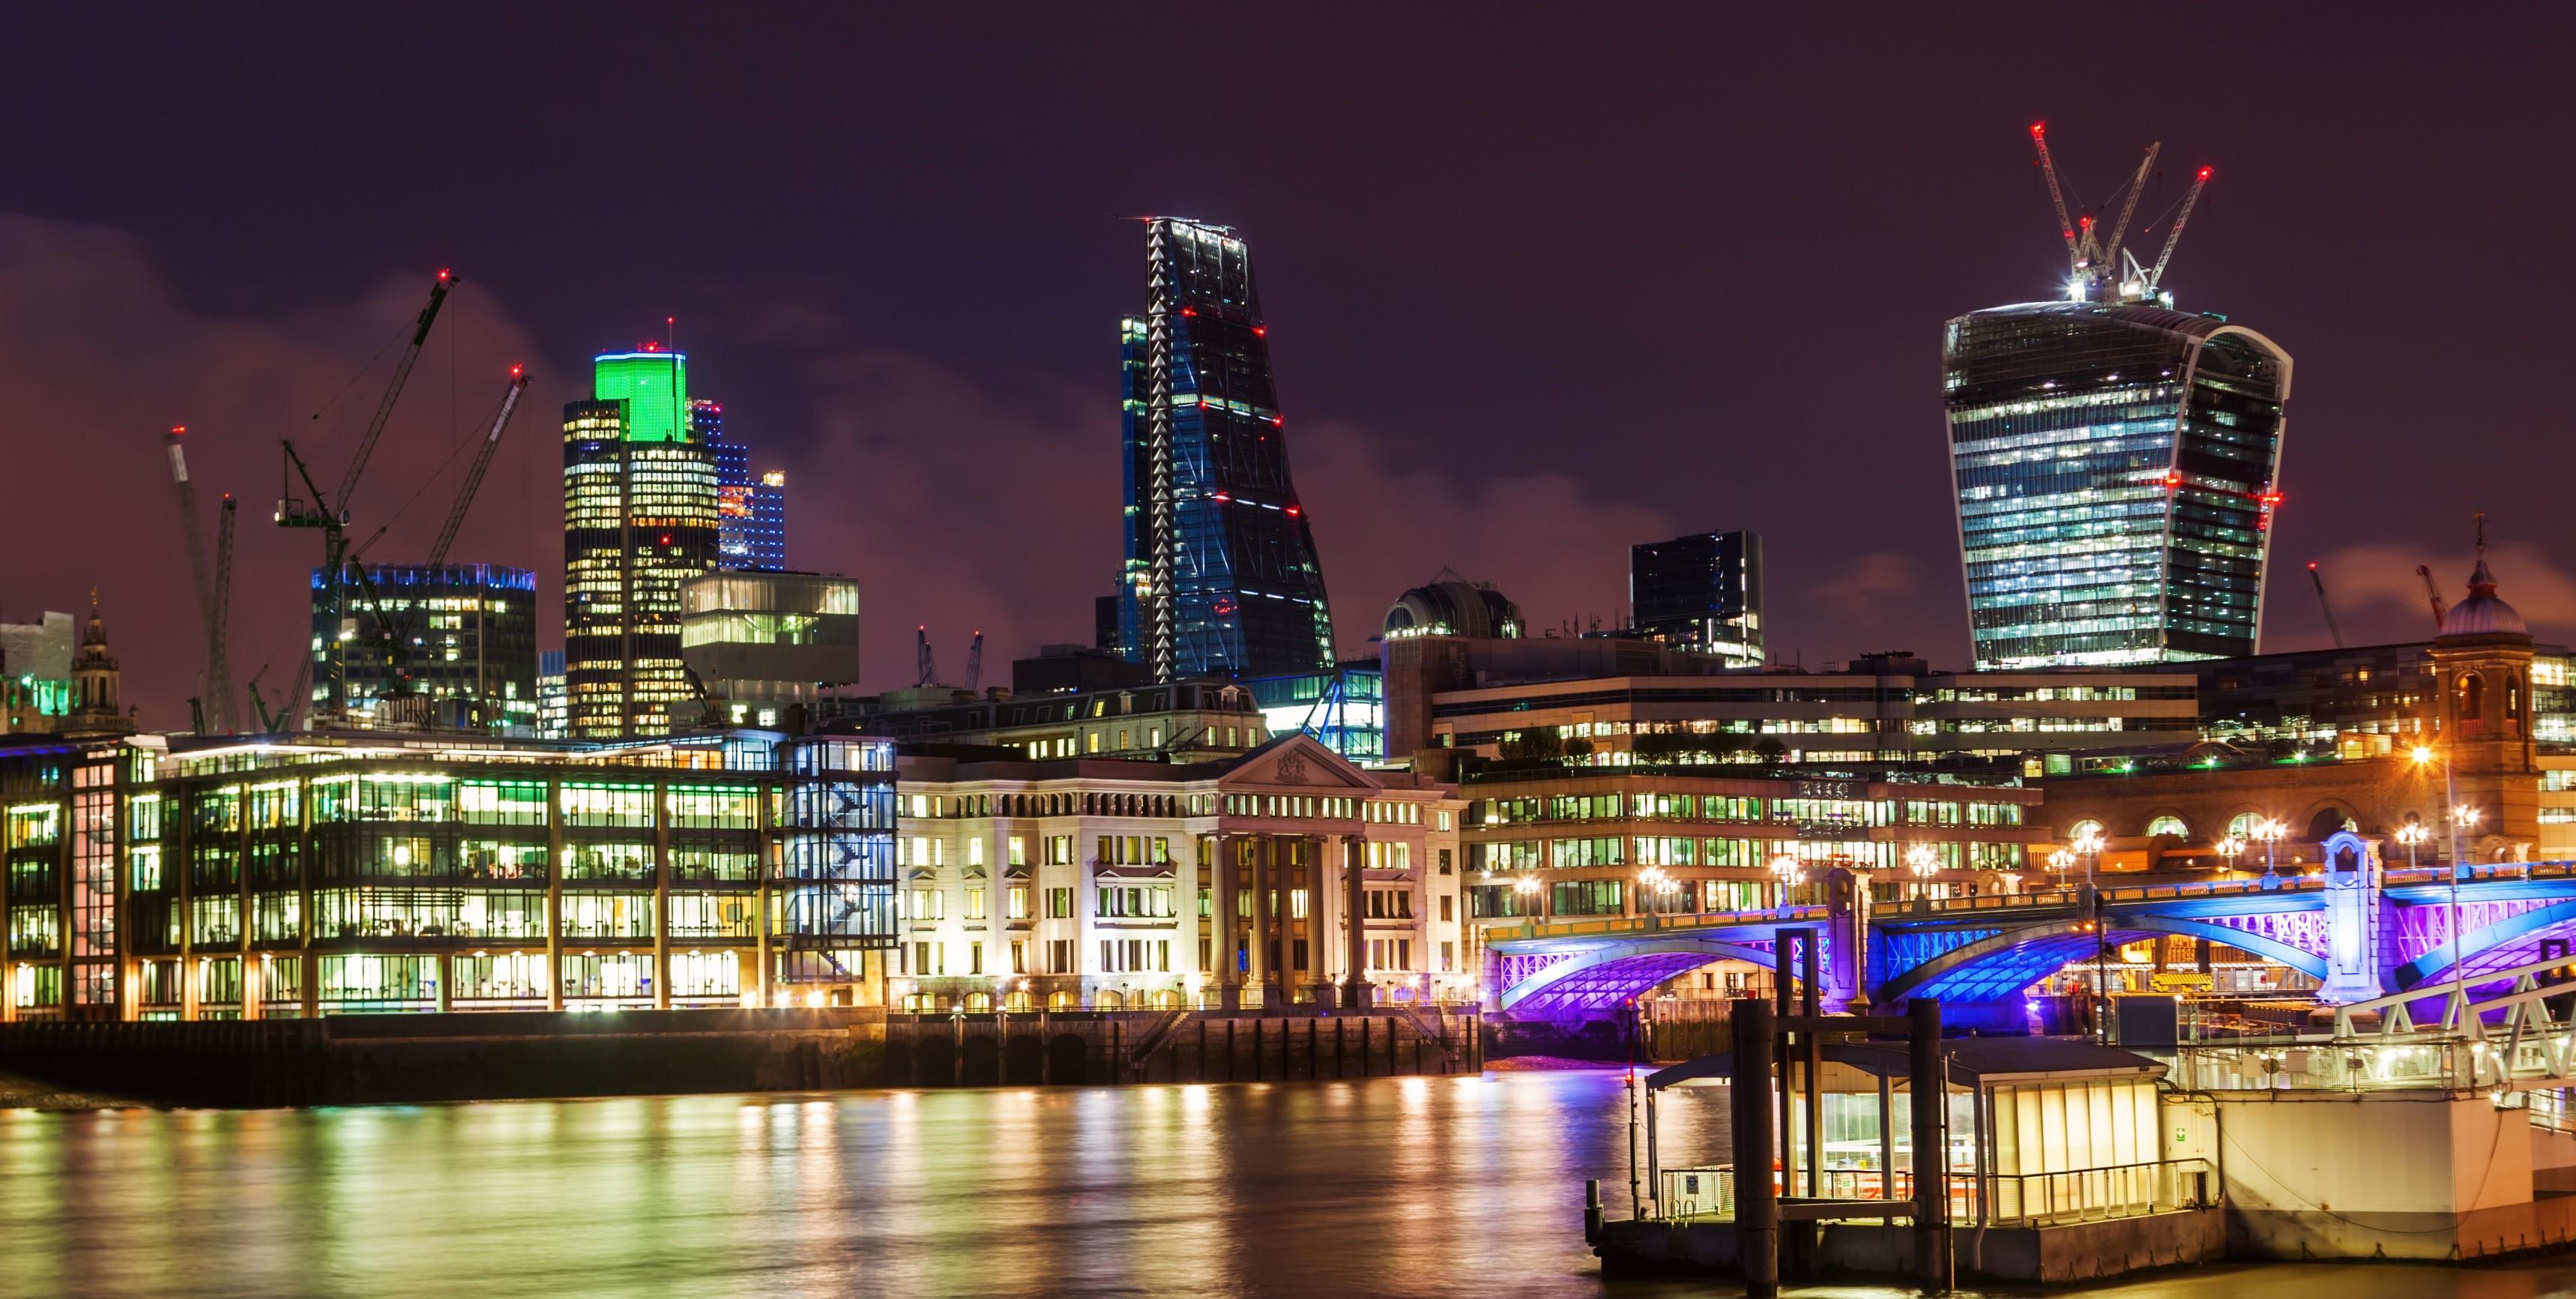 NBN-London